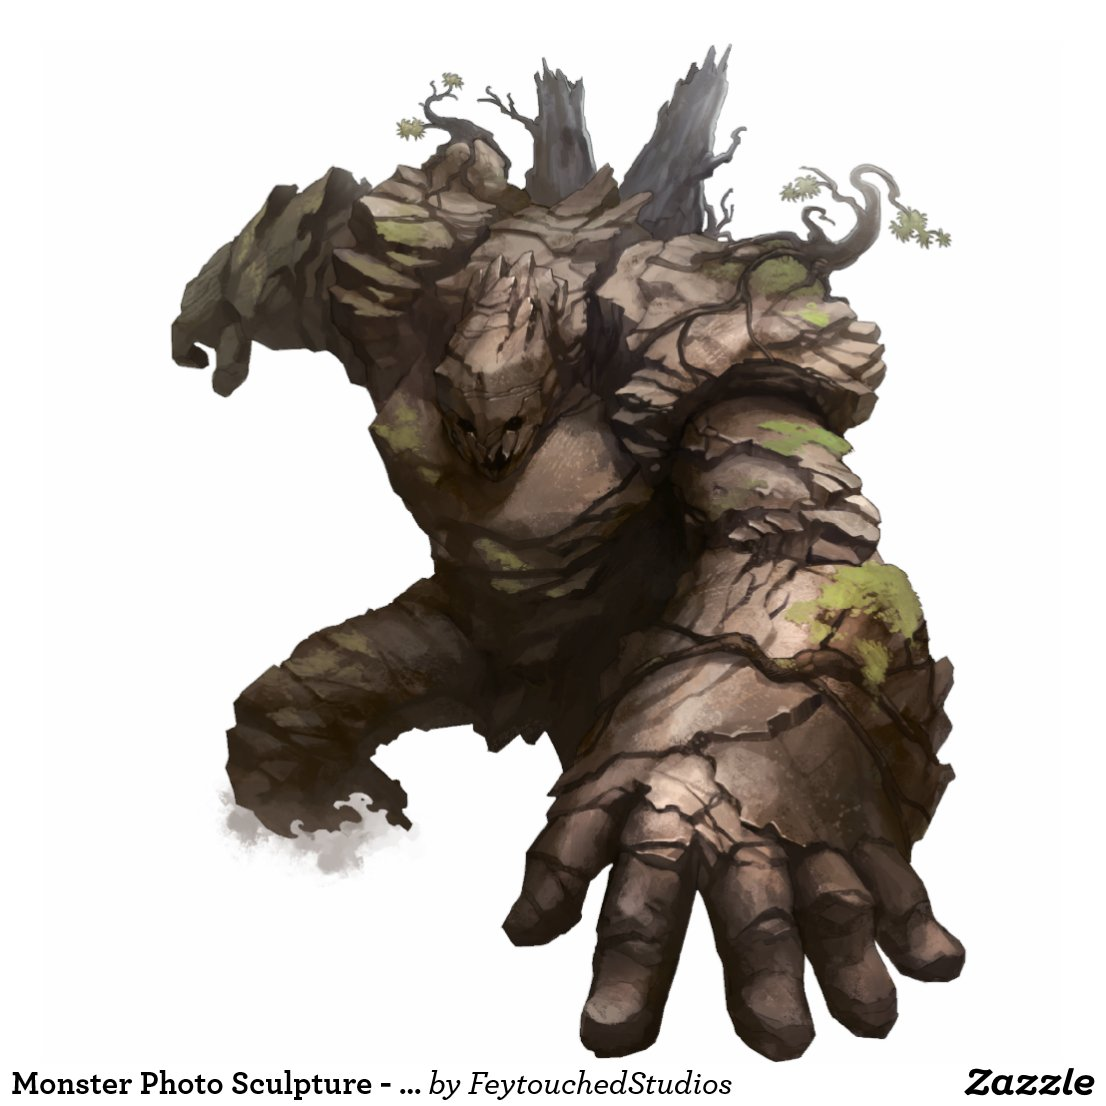 Following Verdant Rumors [Free-Form Job: Flora & Kenna] Monster_foto_skulptur_erde_elementar_freistehende_fotoskulptur-rd7e5ad097007448d9755a00889e56785_x7saw_8byvr_1024